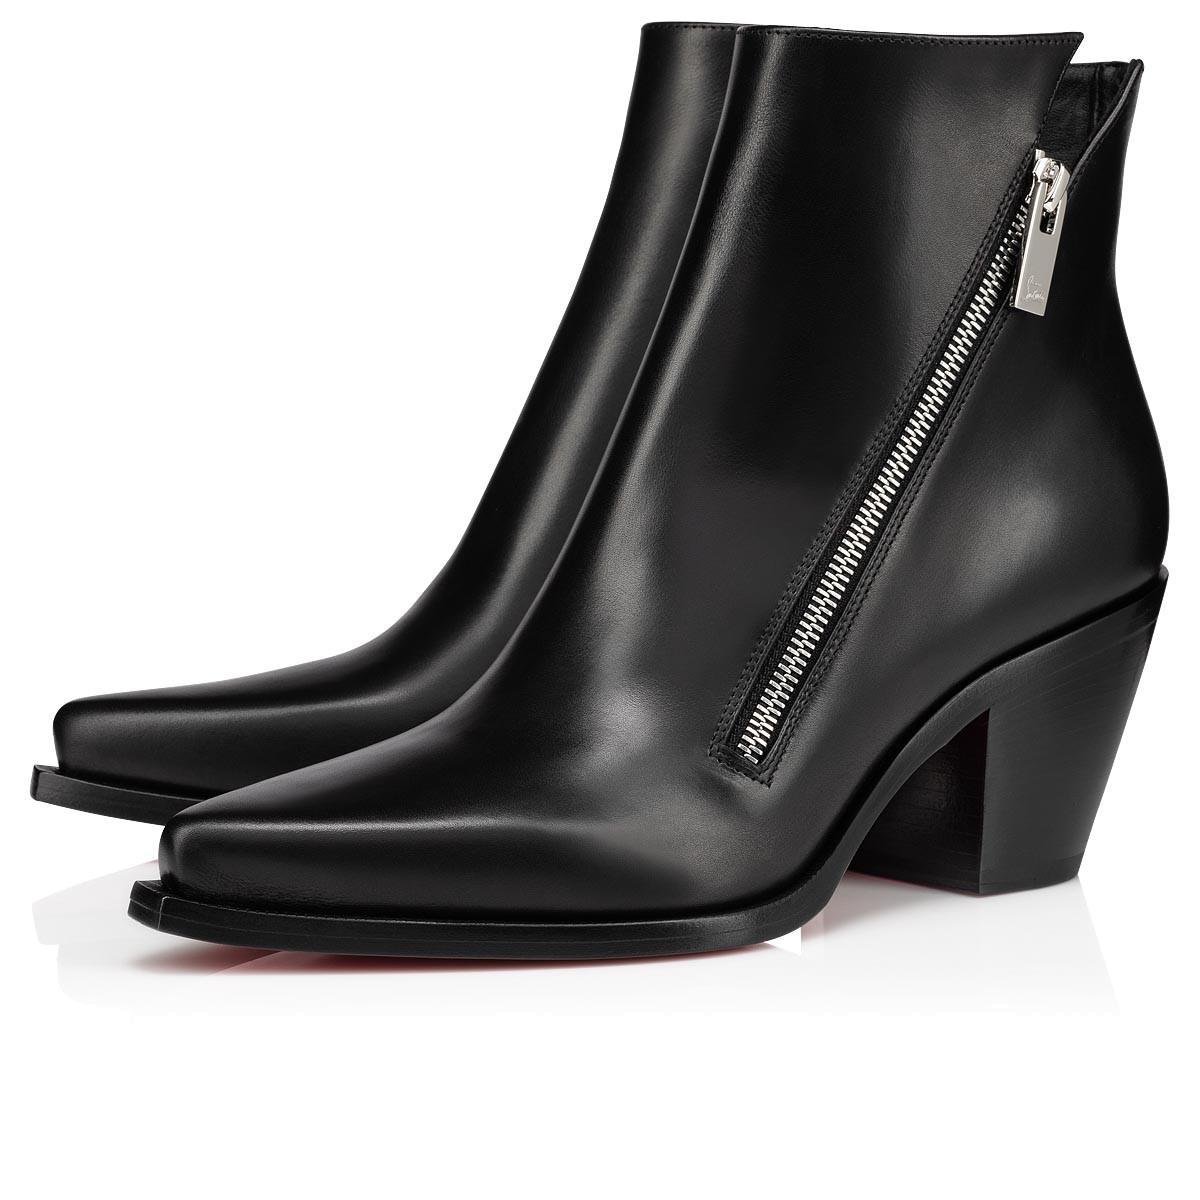 Shoes - Santiazip - Christian Louboutin